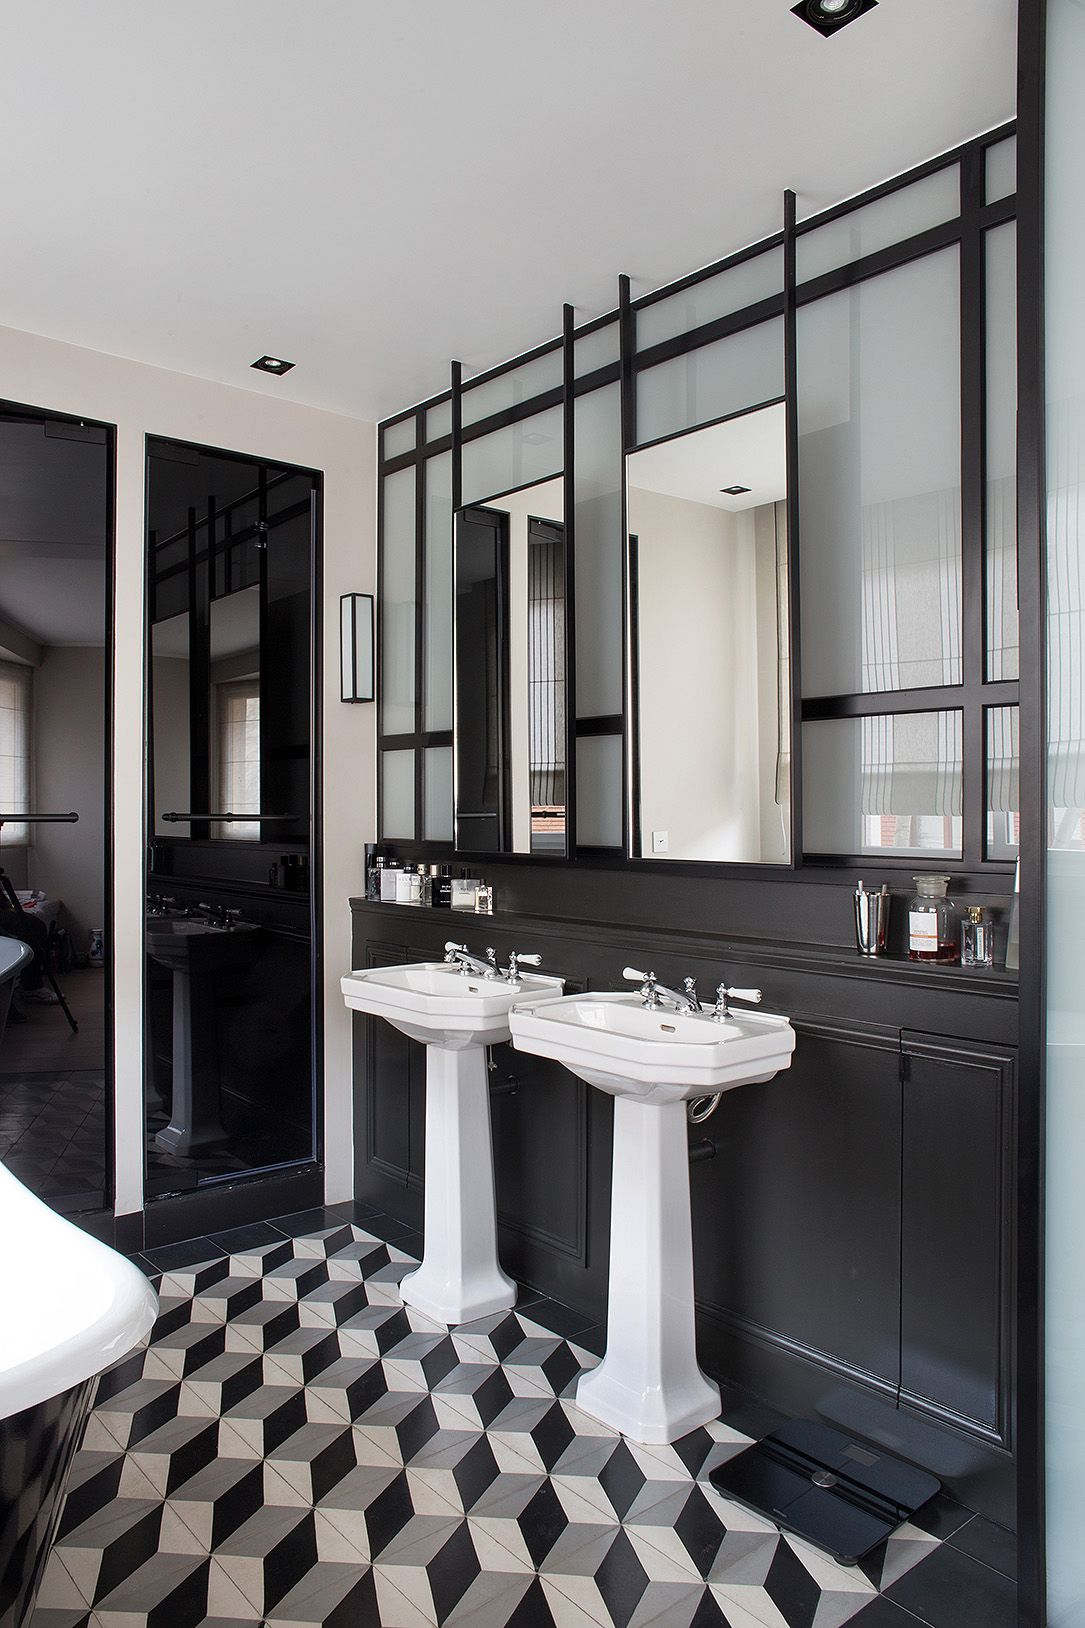 Salle De Bain Noir Et Blanc Black And White Bathroom